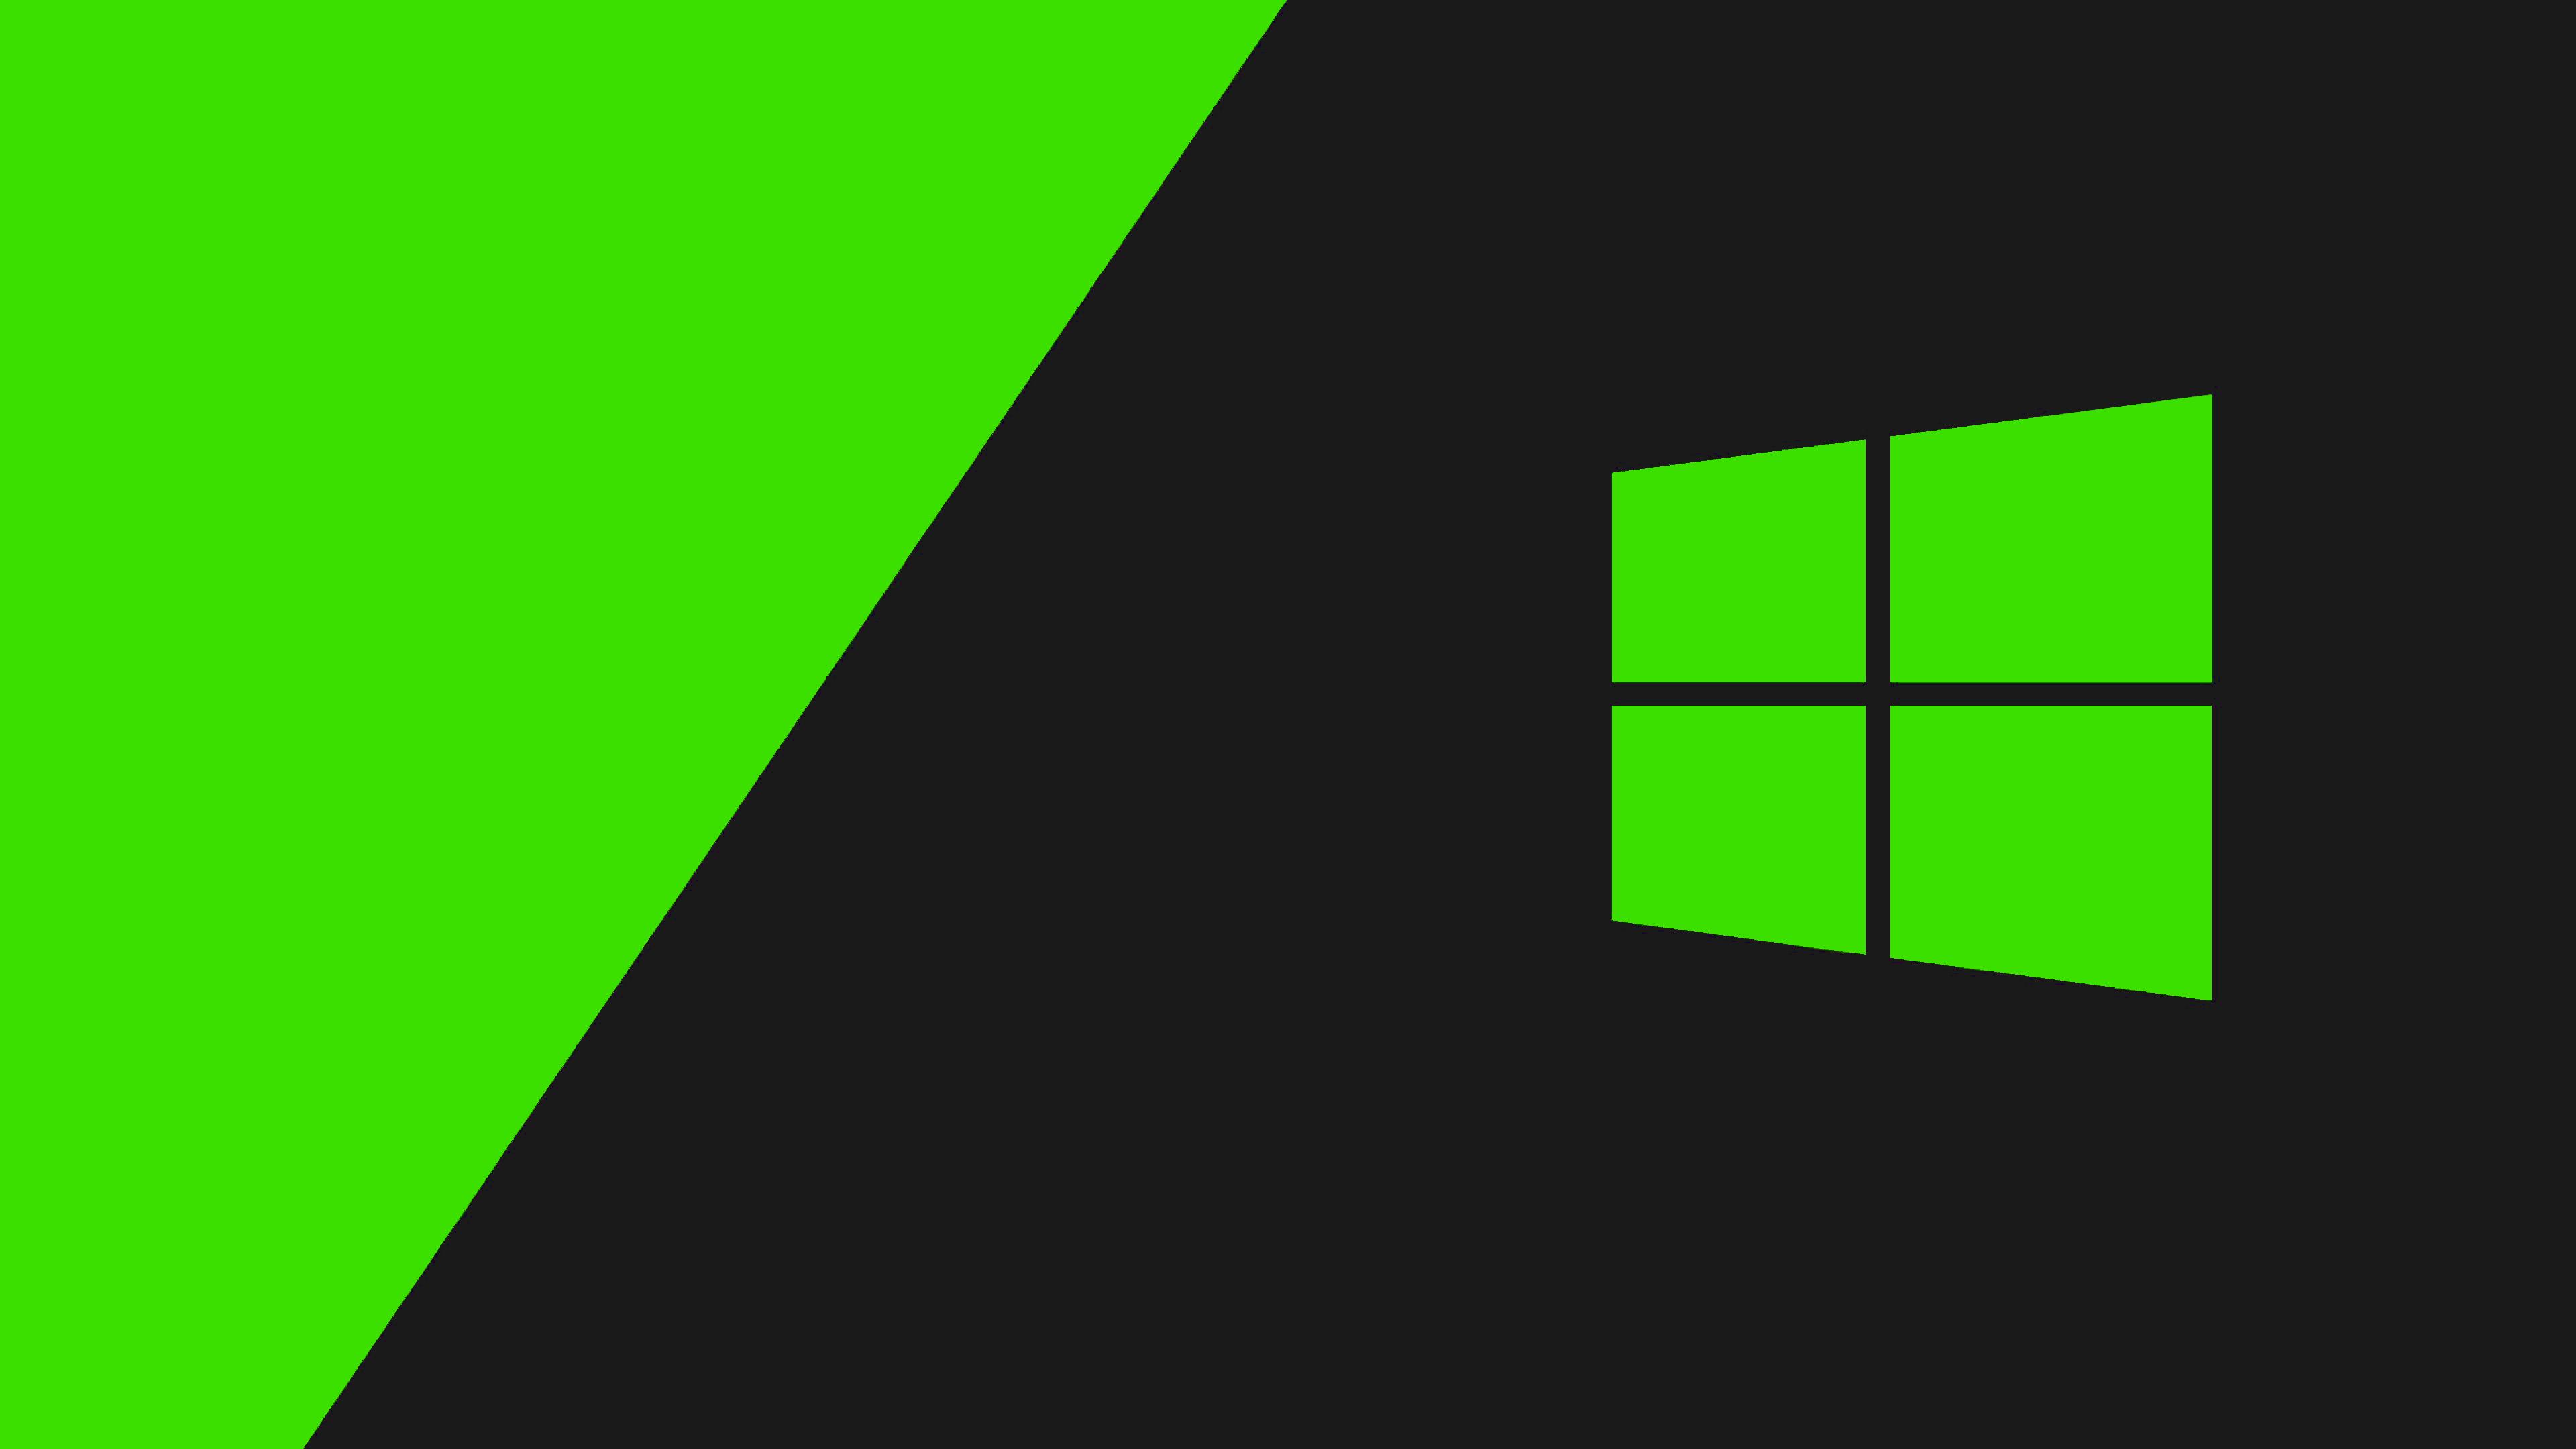 Windows 10 Background Green - HD Wallpaper